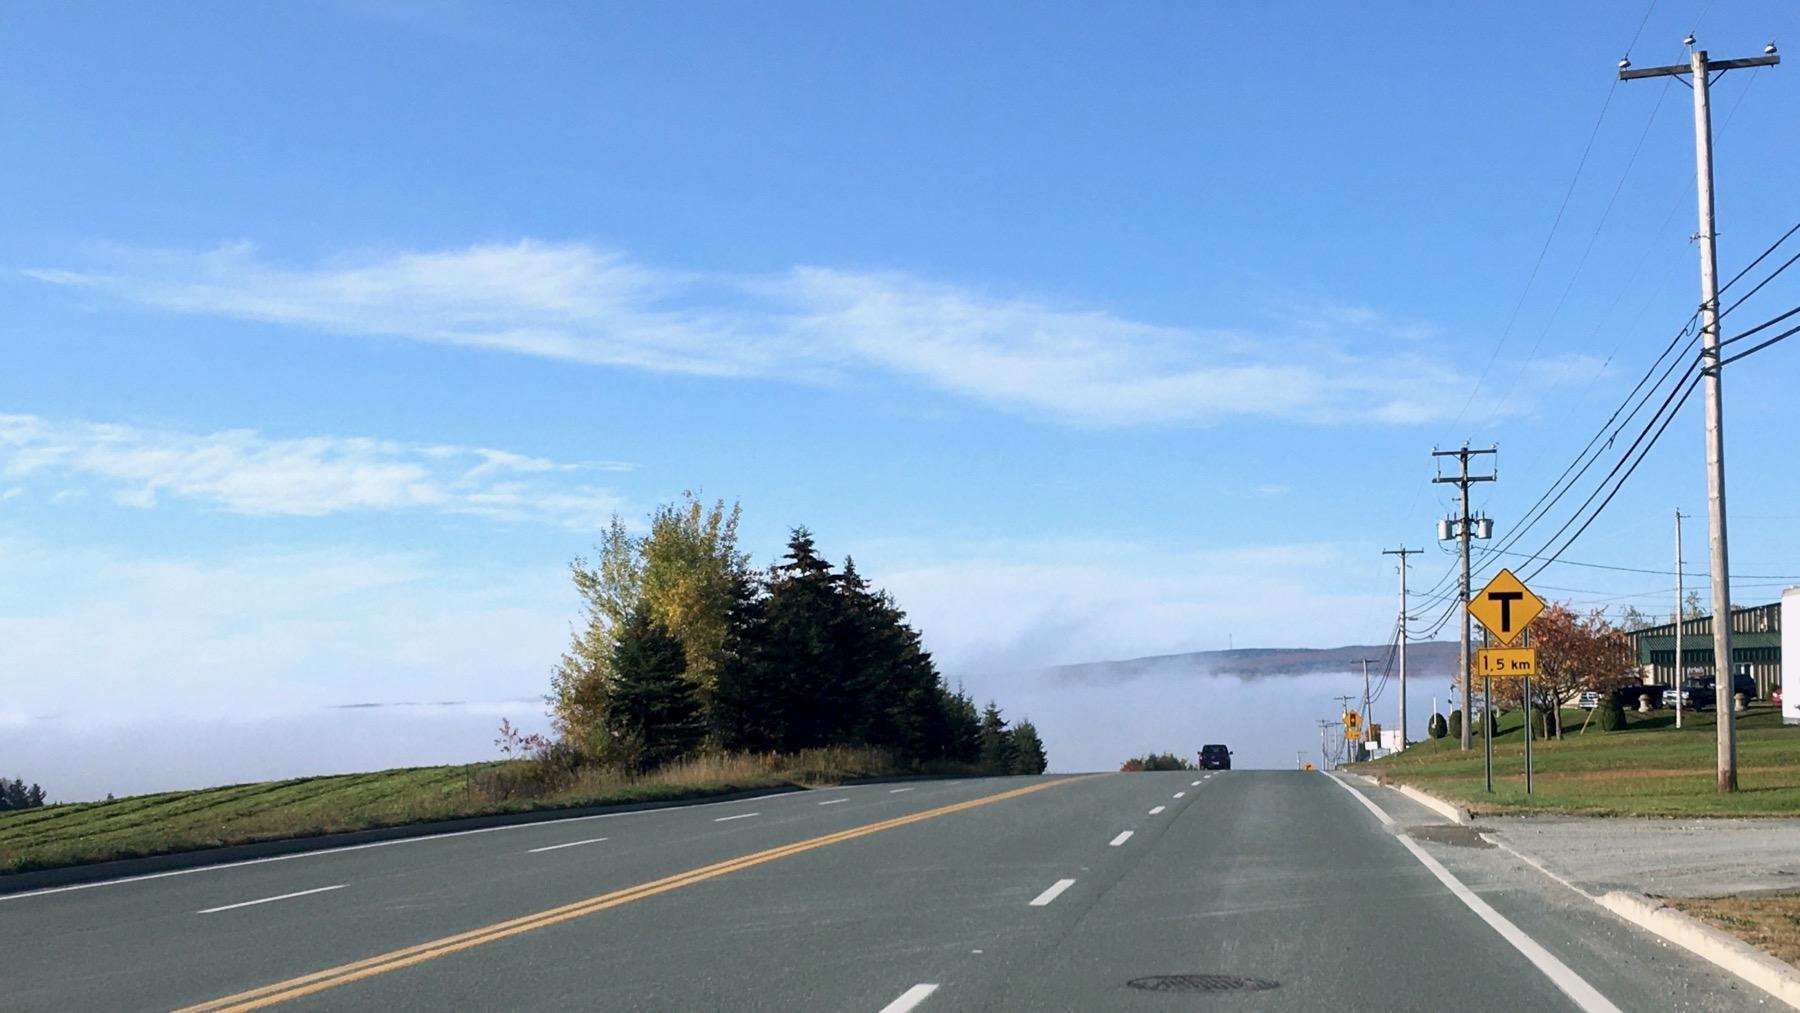 Fog in little valley